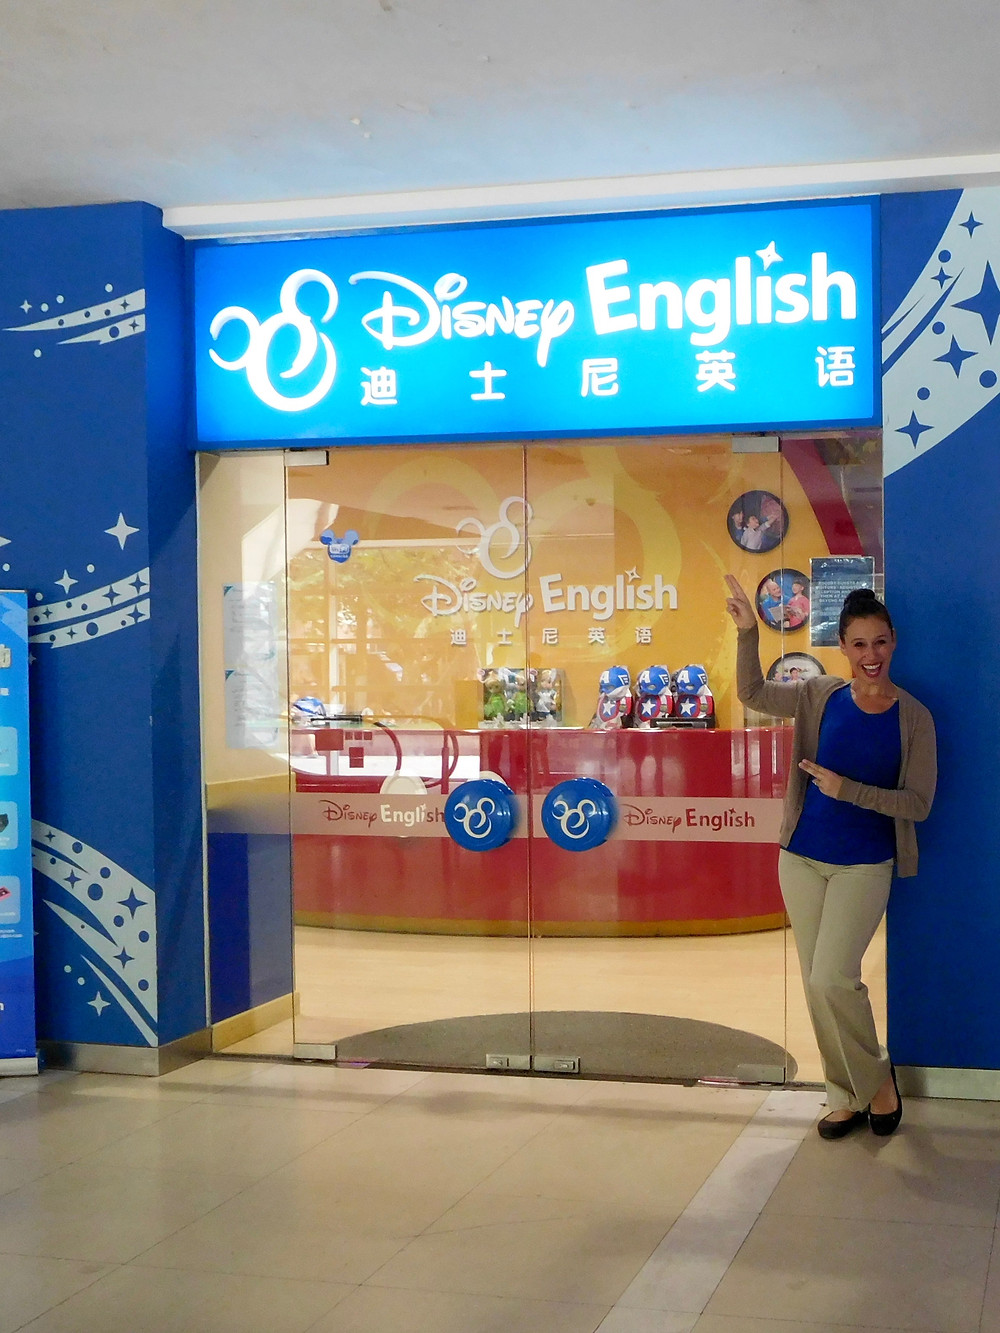 Disney English in Shanghai, China